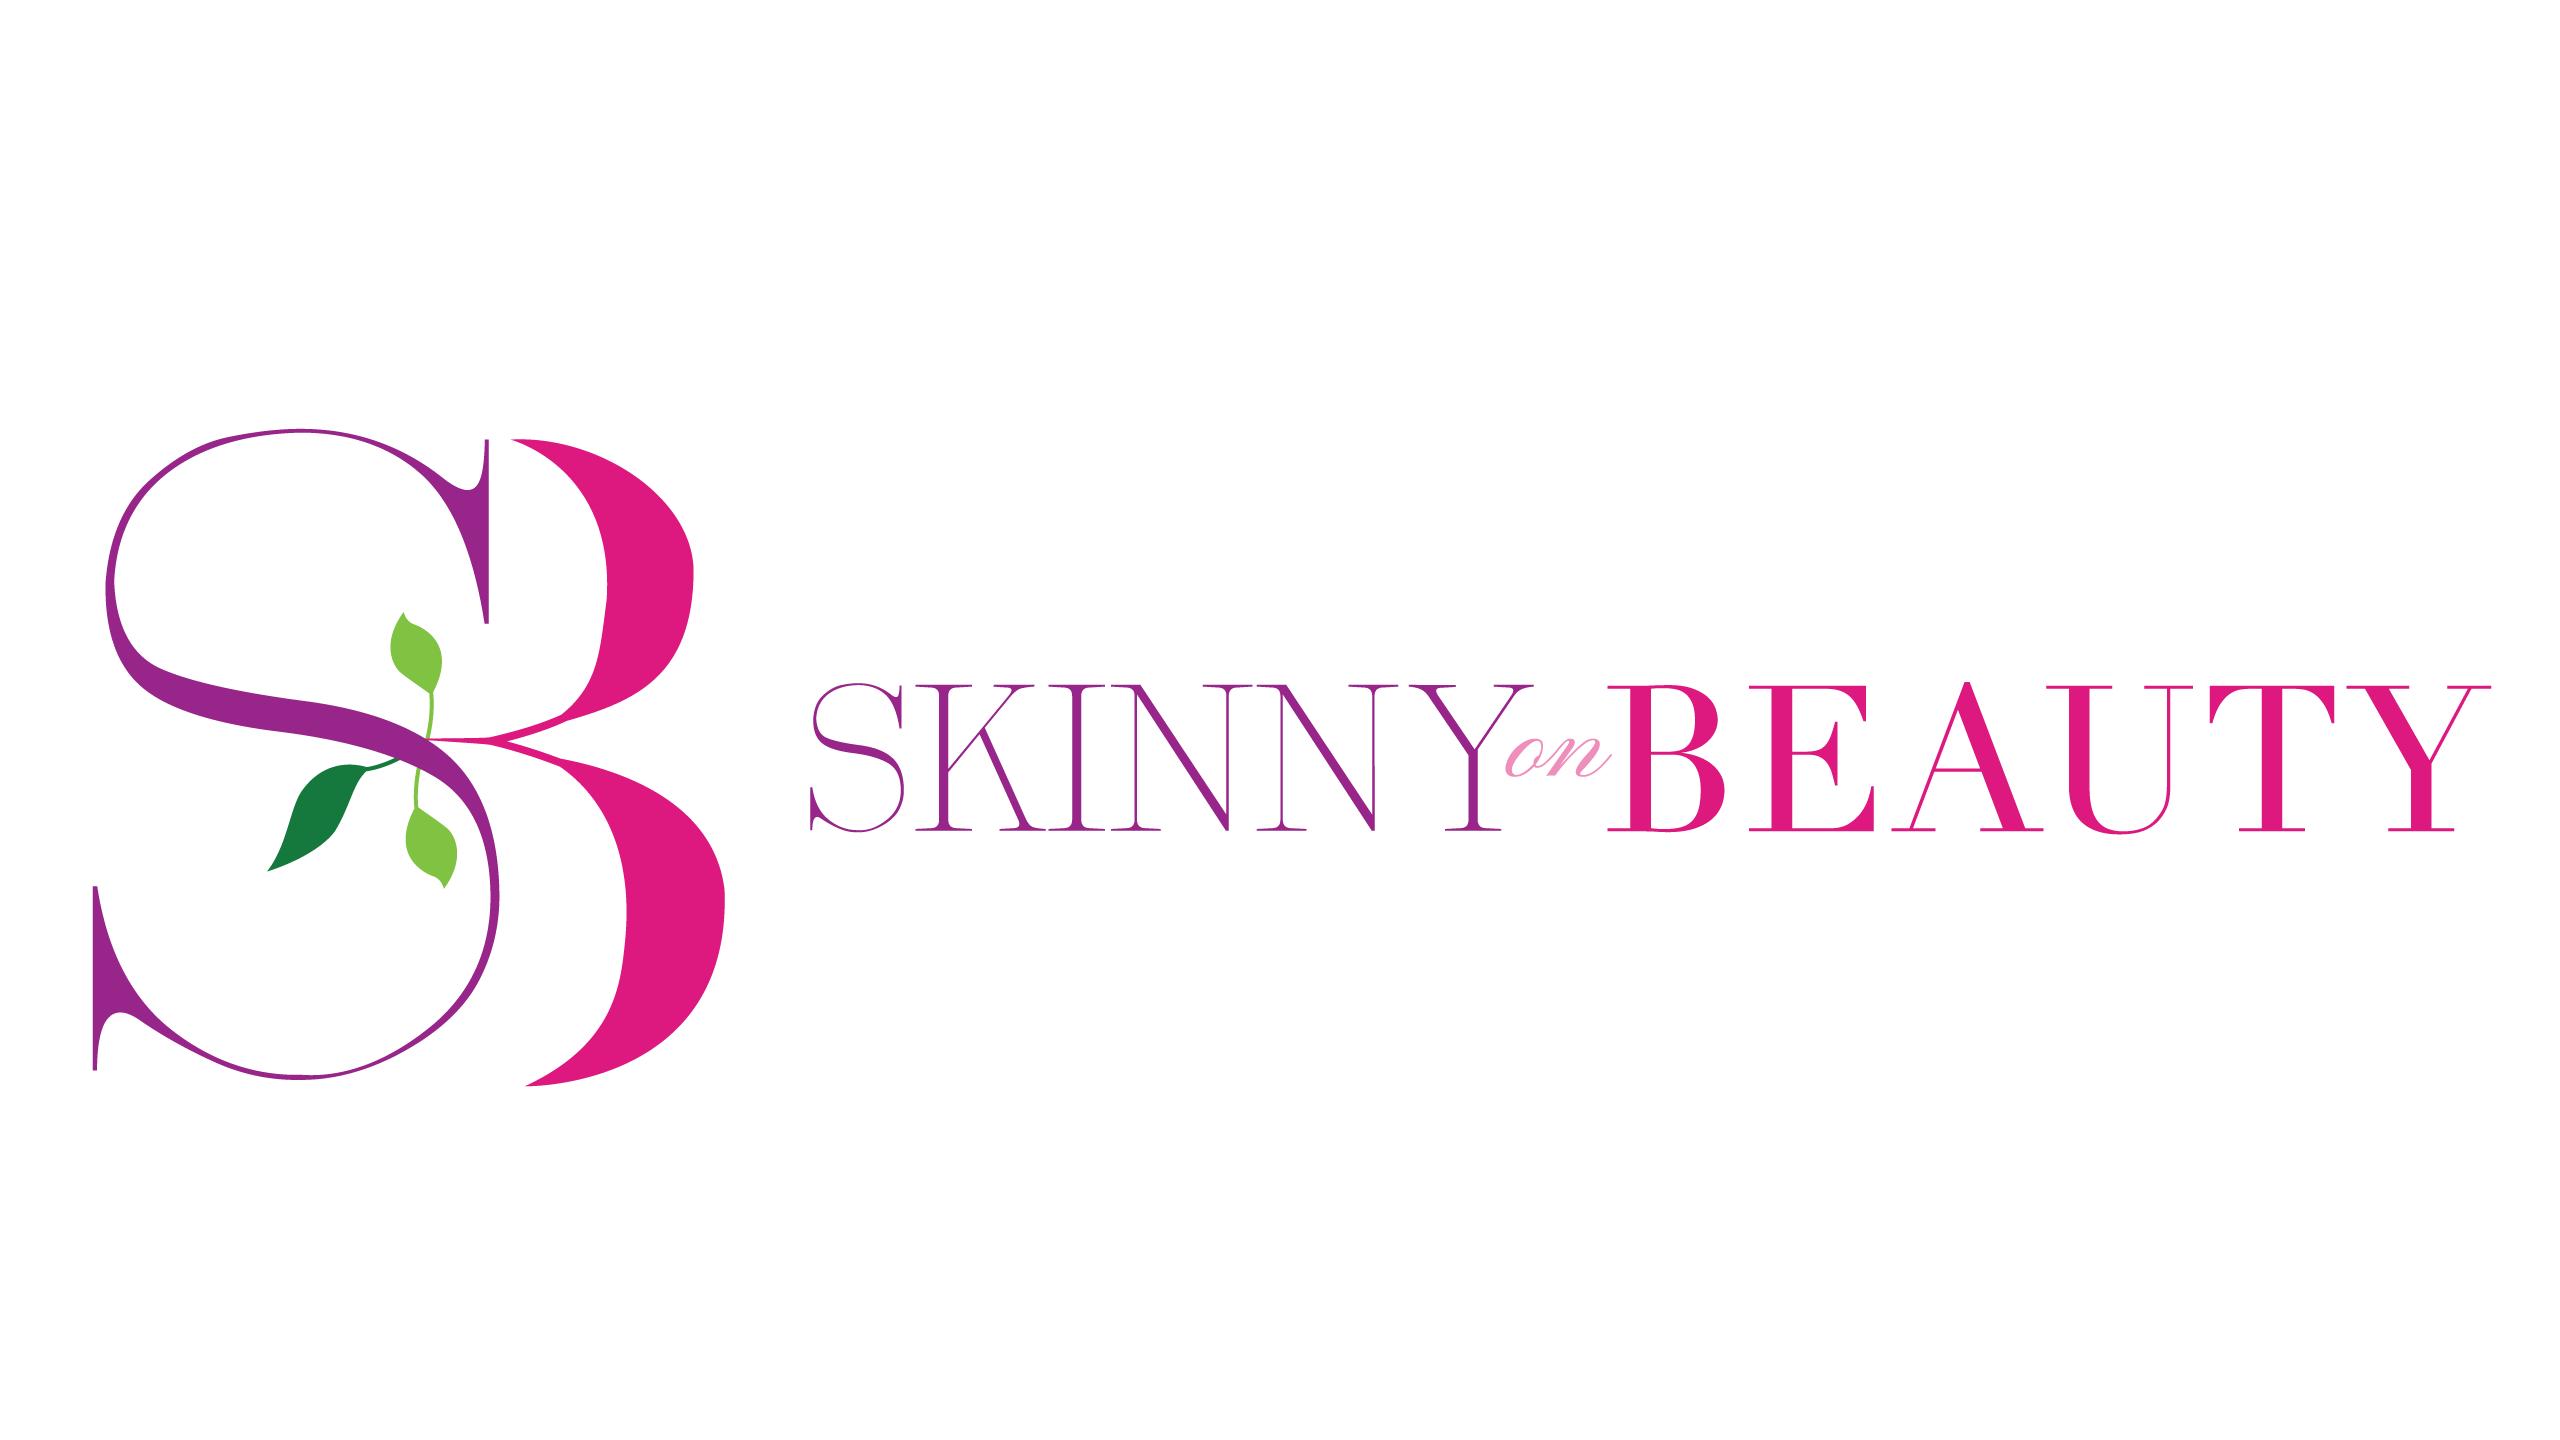 The Skinny on Beauty